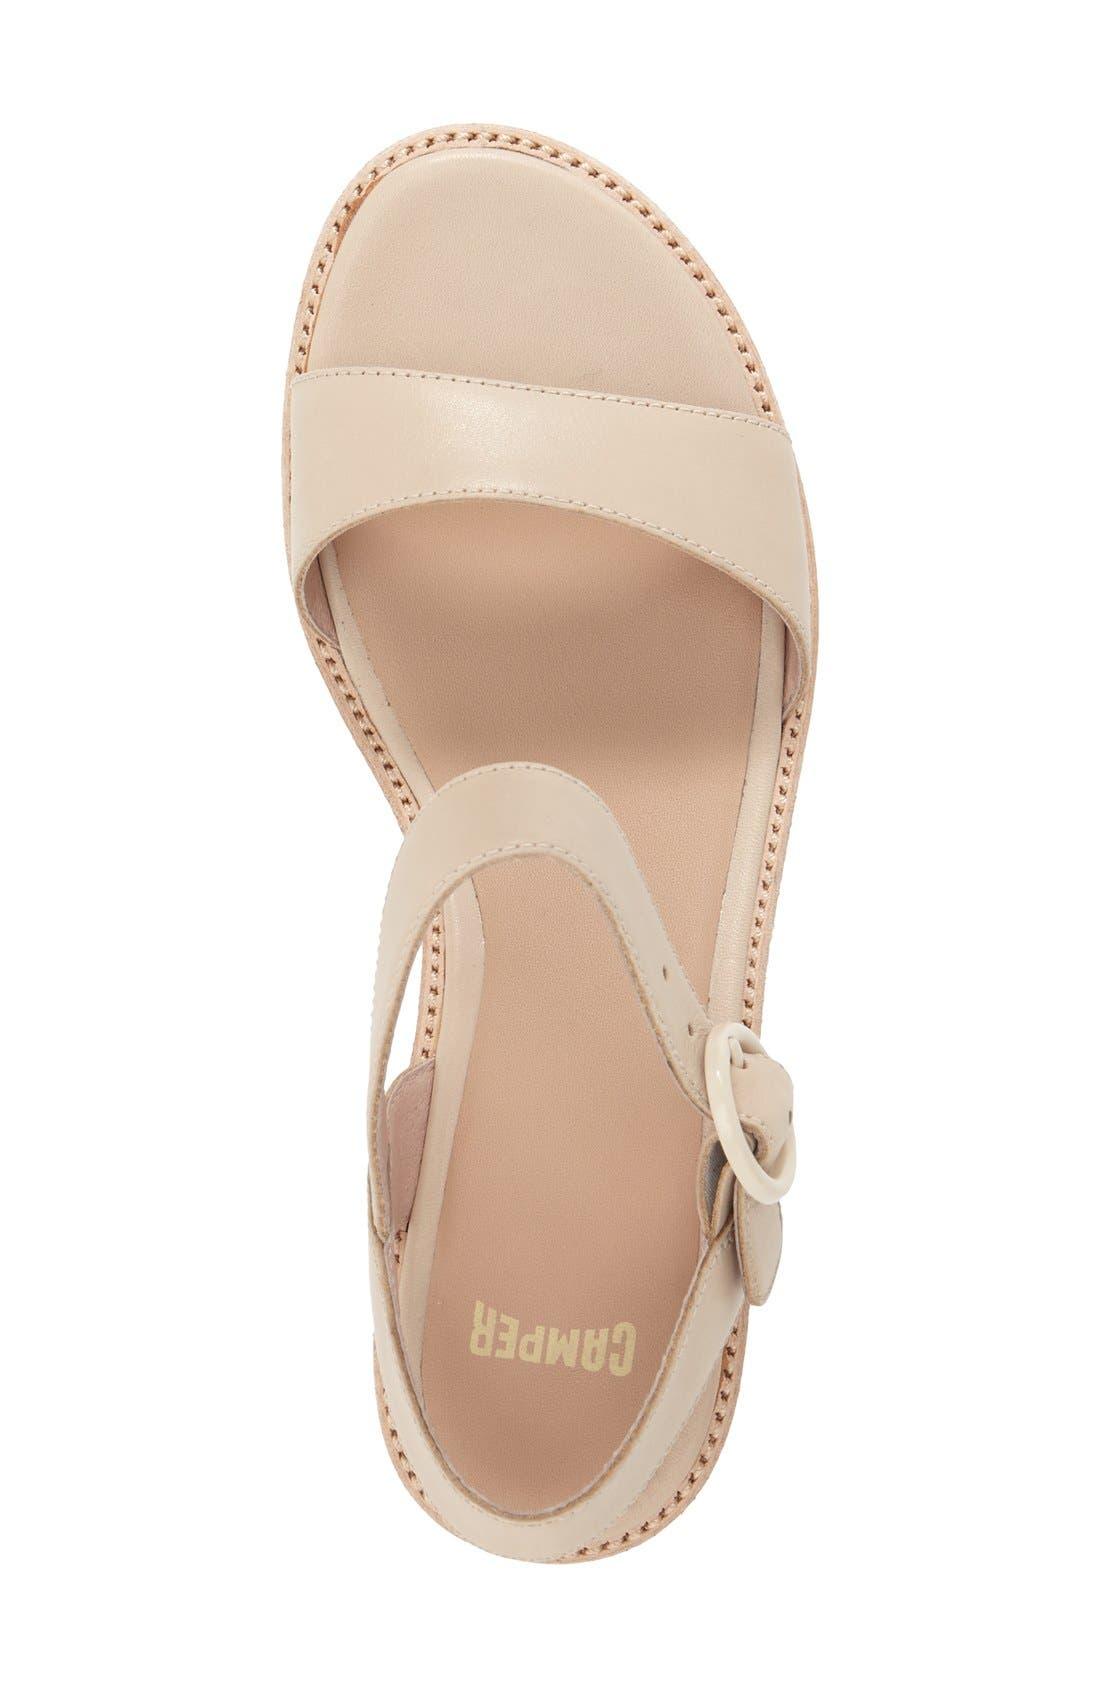 'Damas' Wedge Sandal,                             Alternate thumbnail 44, color,